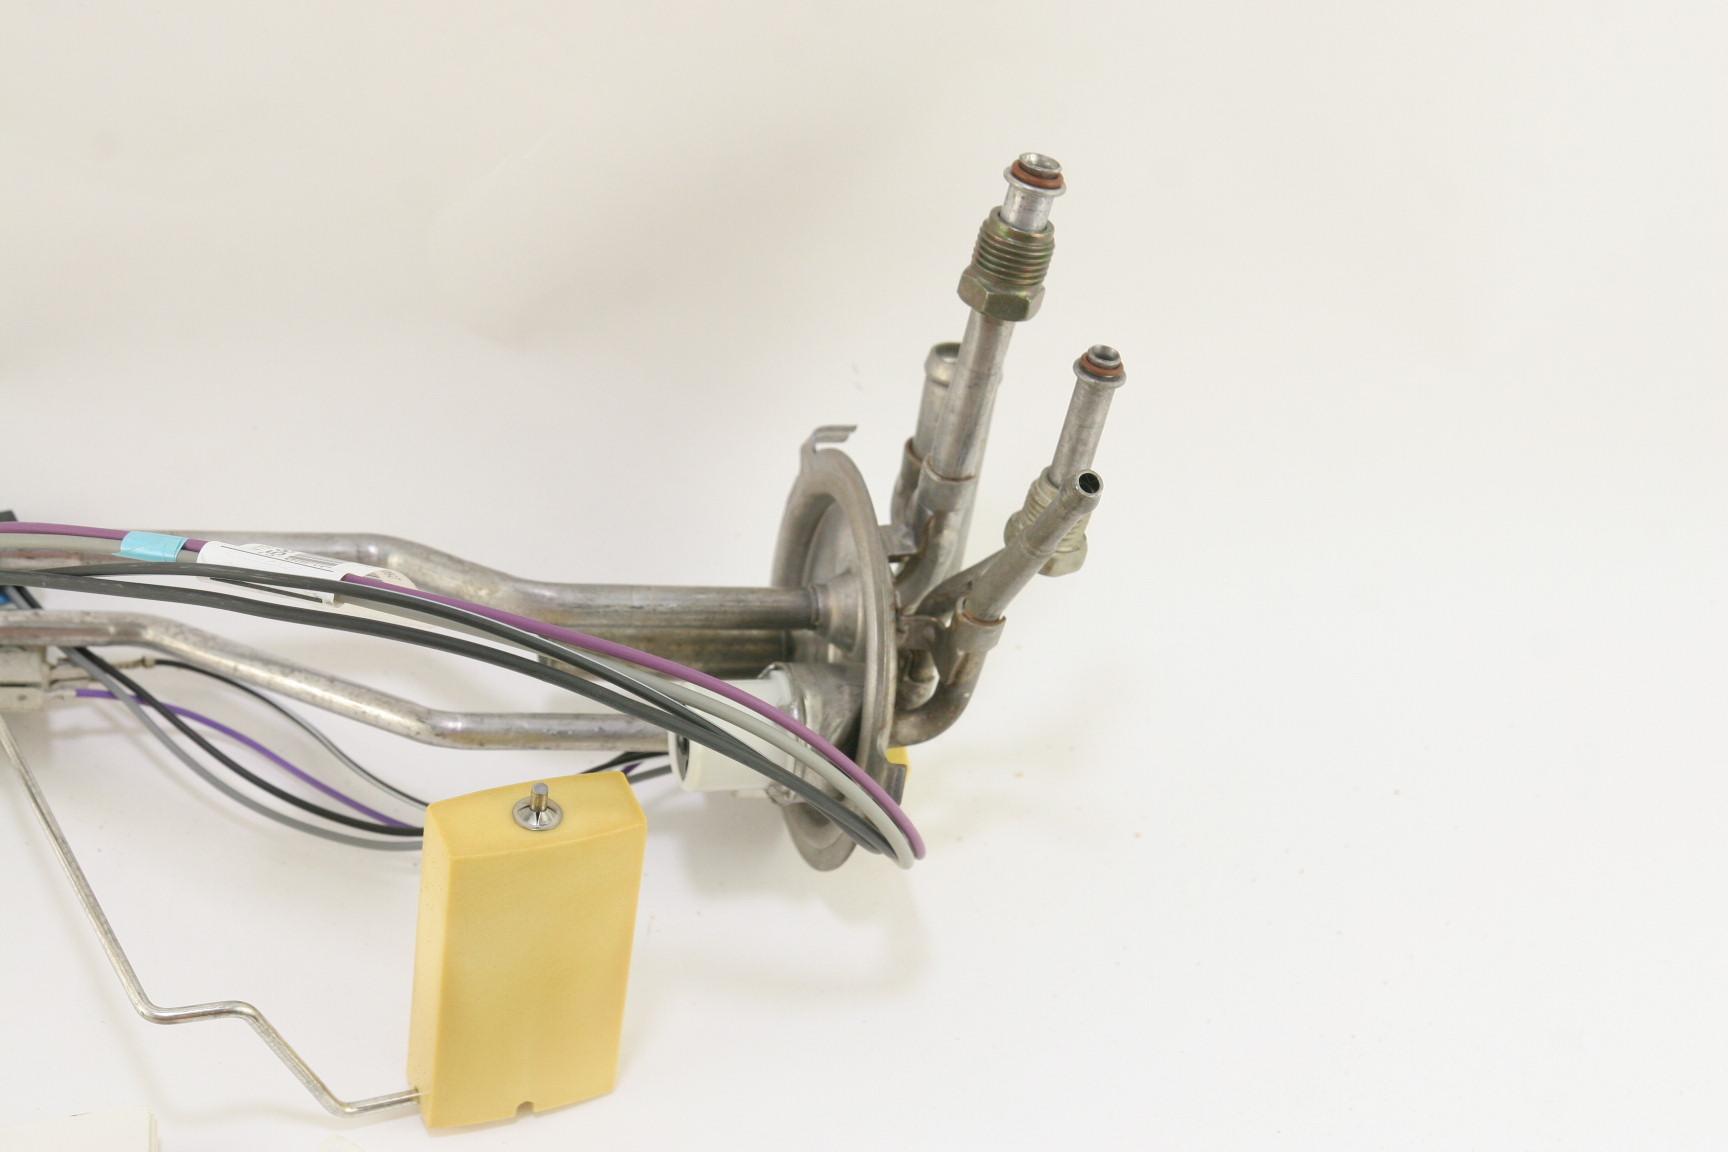 New Acdelco Oem Gm 25028889 Fuel Tank Sending Unit Free Shipping Nip Wiring